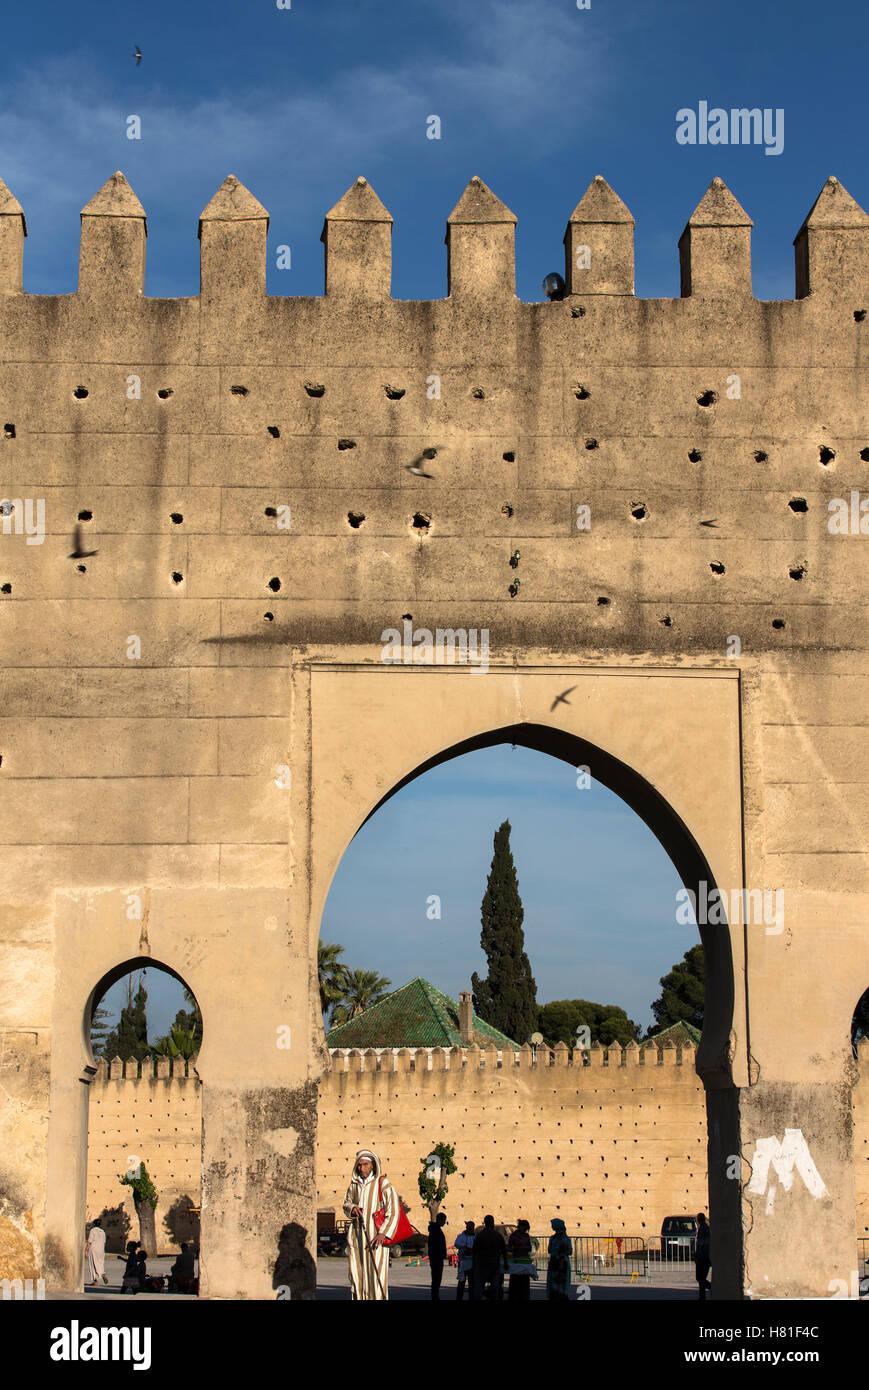 Morocco,Fez, walls of the mechouar surrounding the city - Stock Image